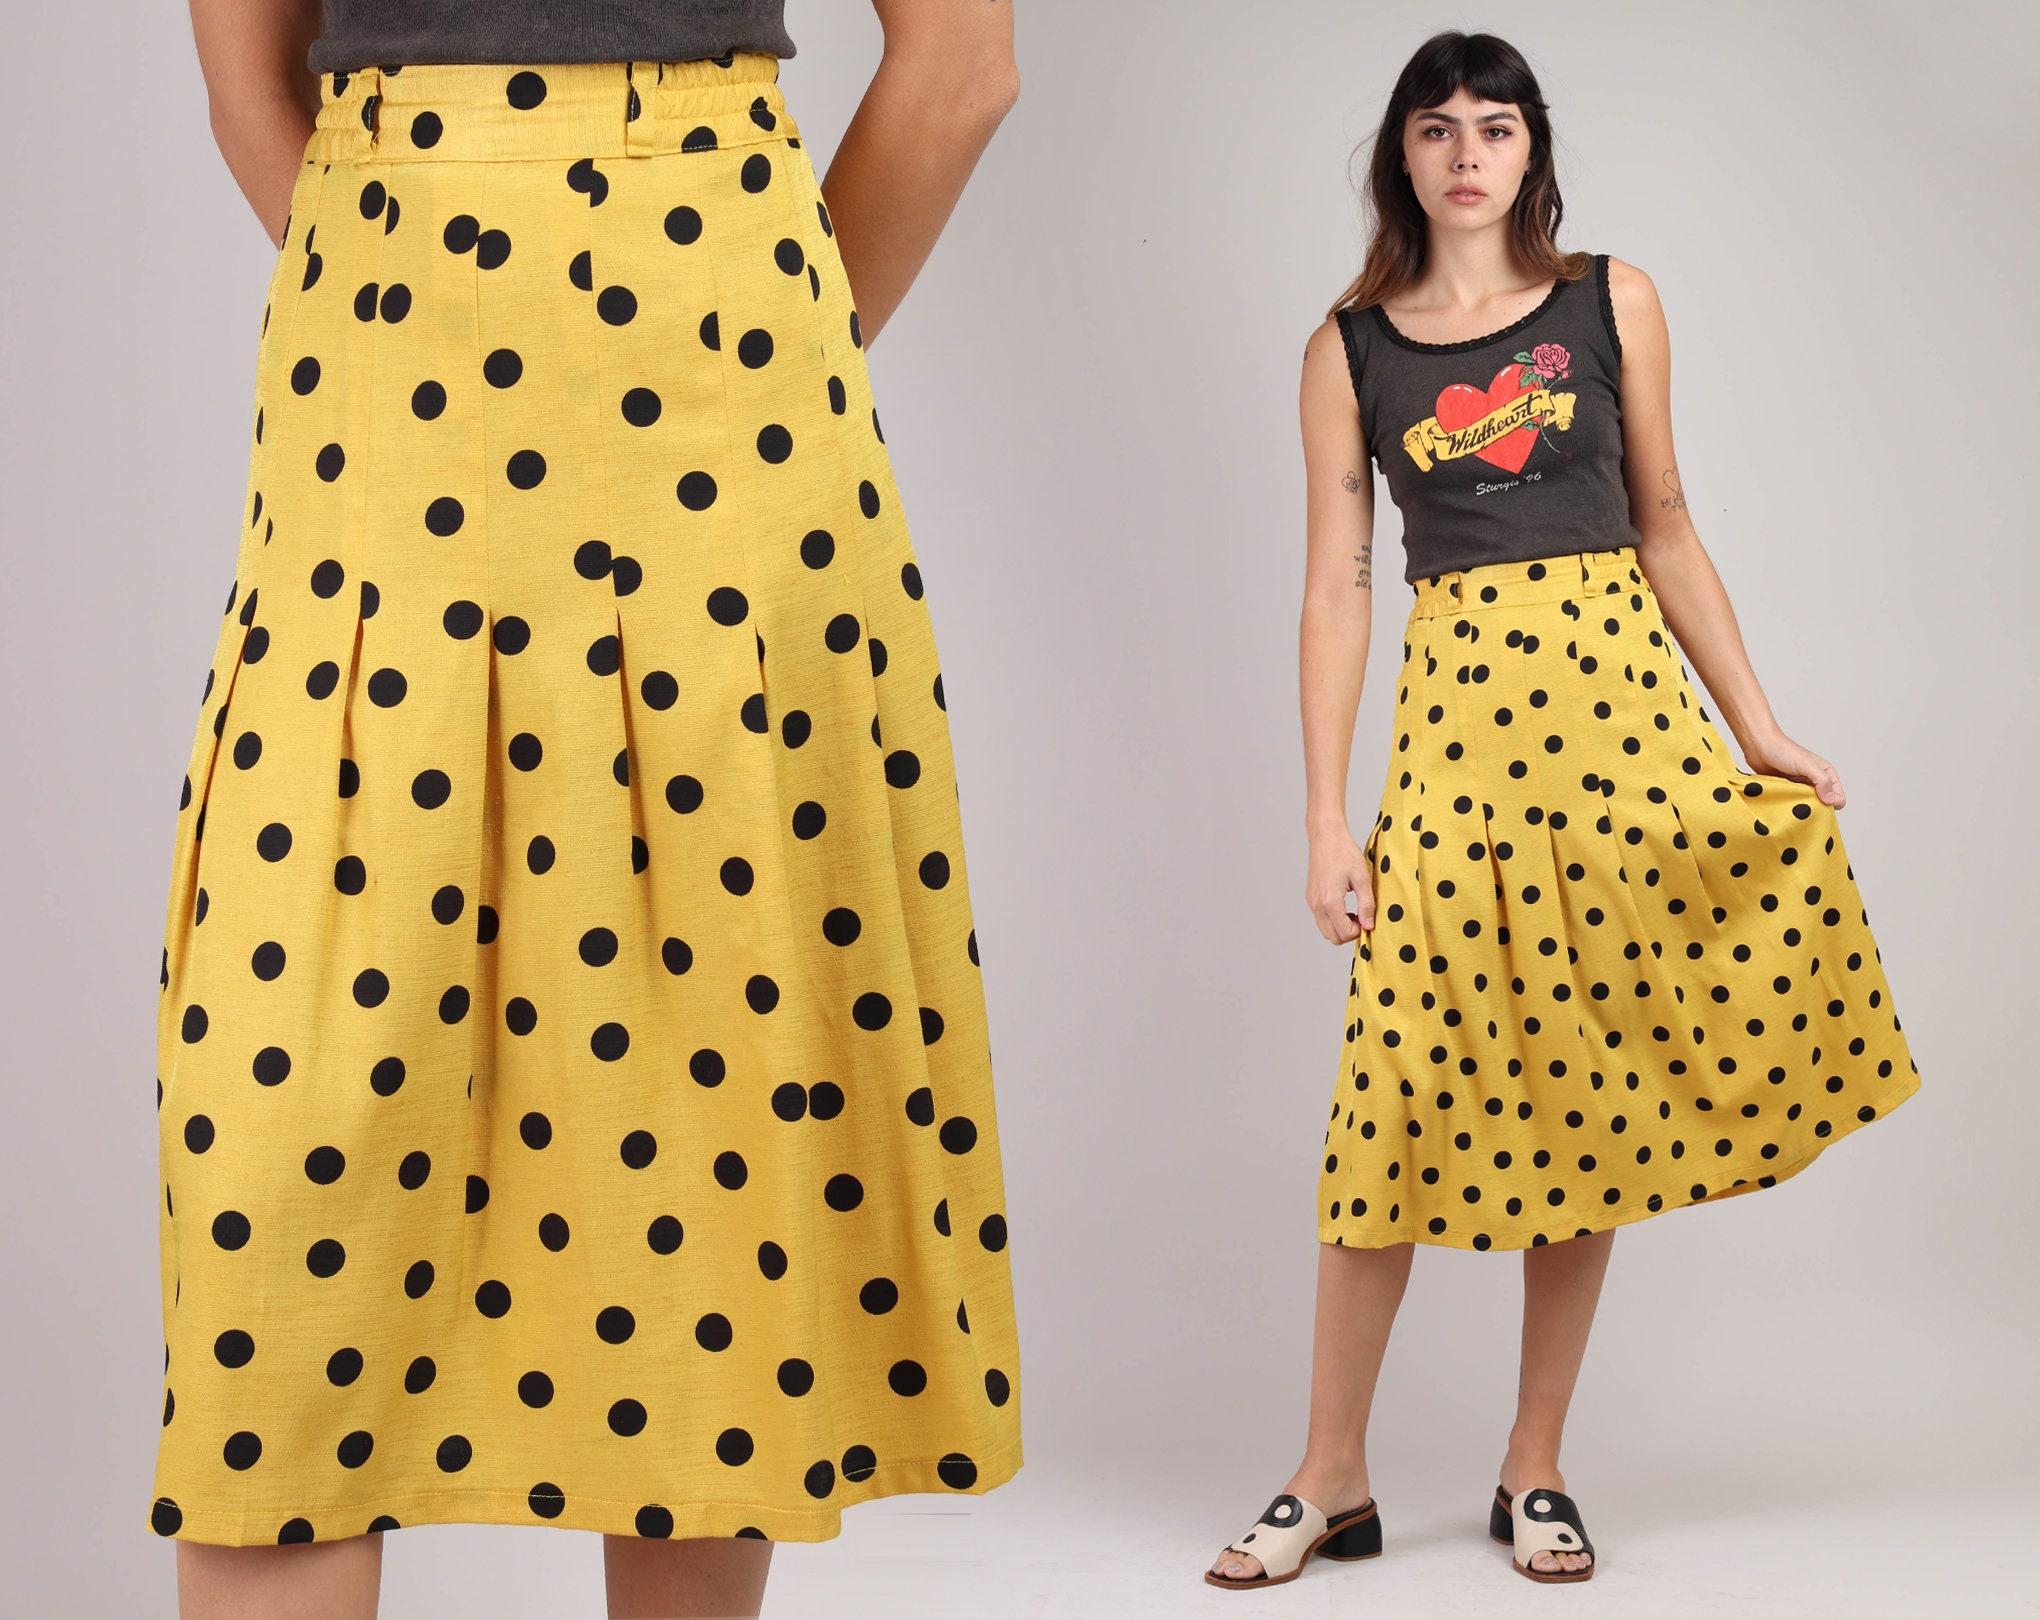 80s Dresses | Casual to Party Dresses 90S Yellow Polka Dot Skirt S MHigh Waist Pleated Midi Bumble Bee Black Polka Dot Knee Length Small Medium 1990S 80S 1980S $25.99 AT vintagedancer.com